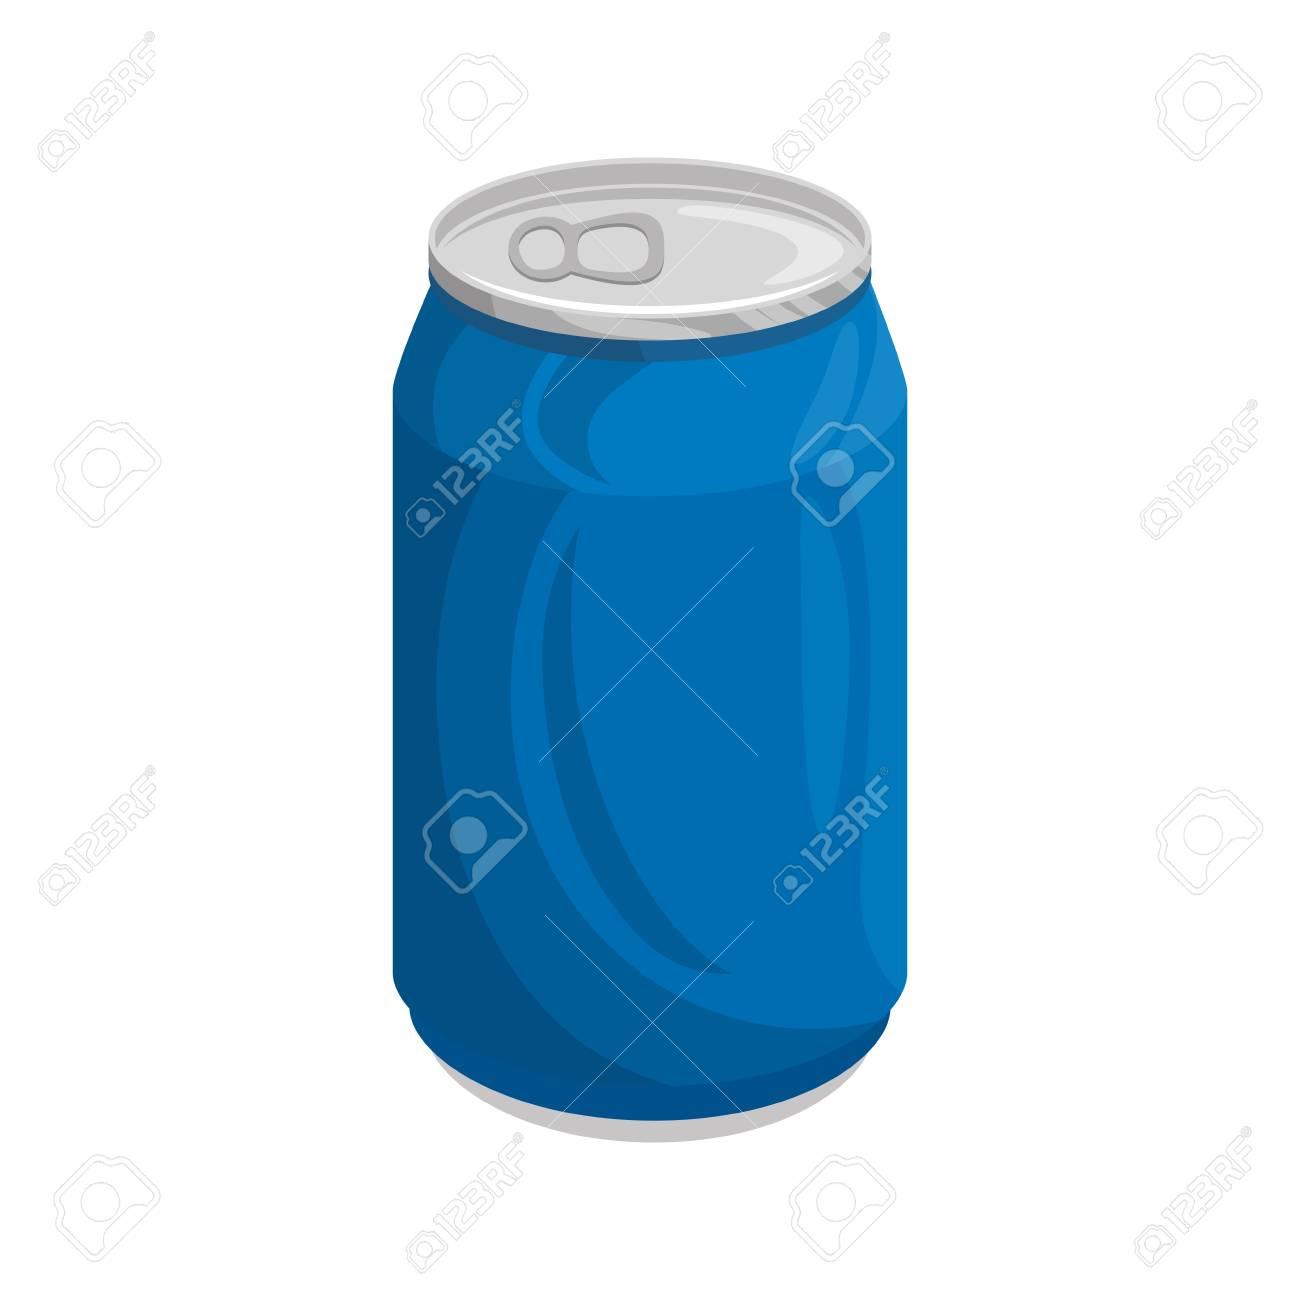 can of soda icon vector illustration graphic design - 80722981